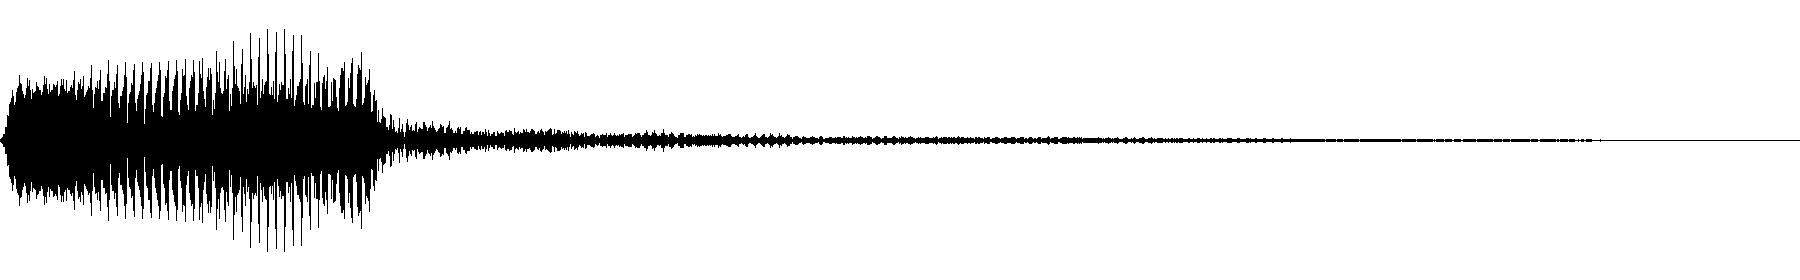 vedh bass cut 014 g